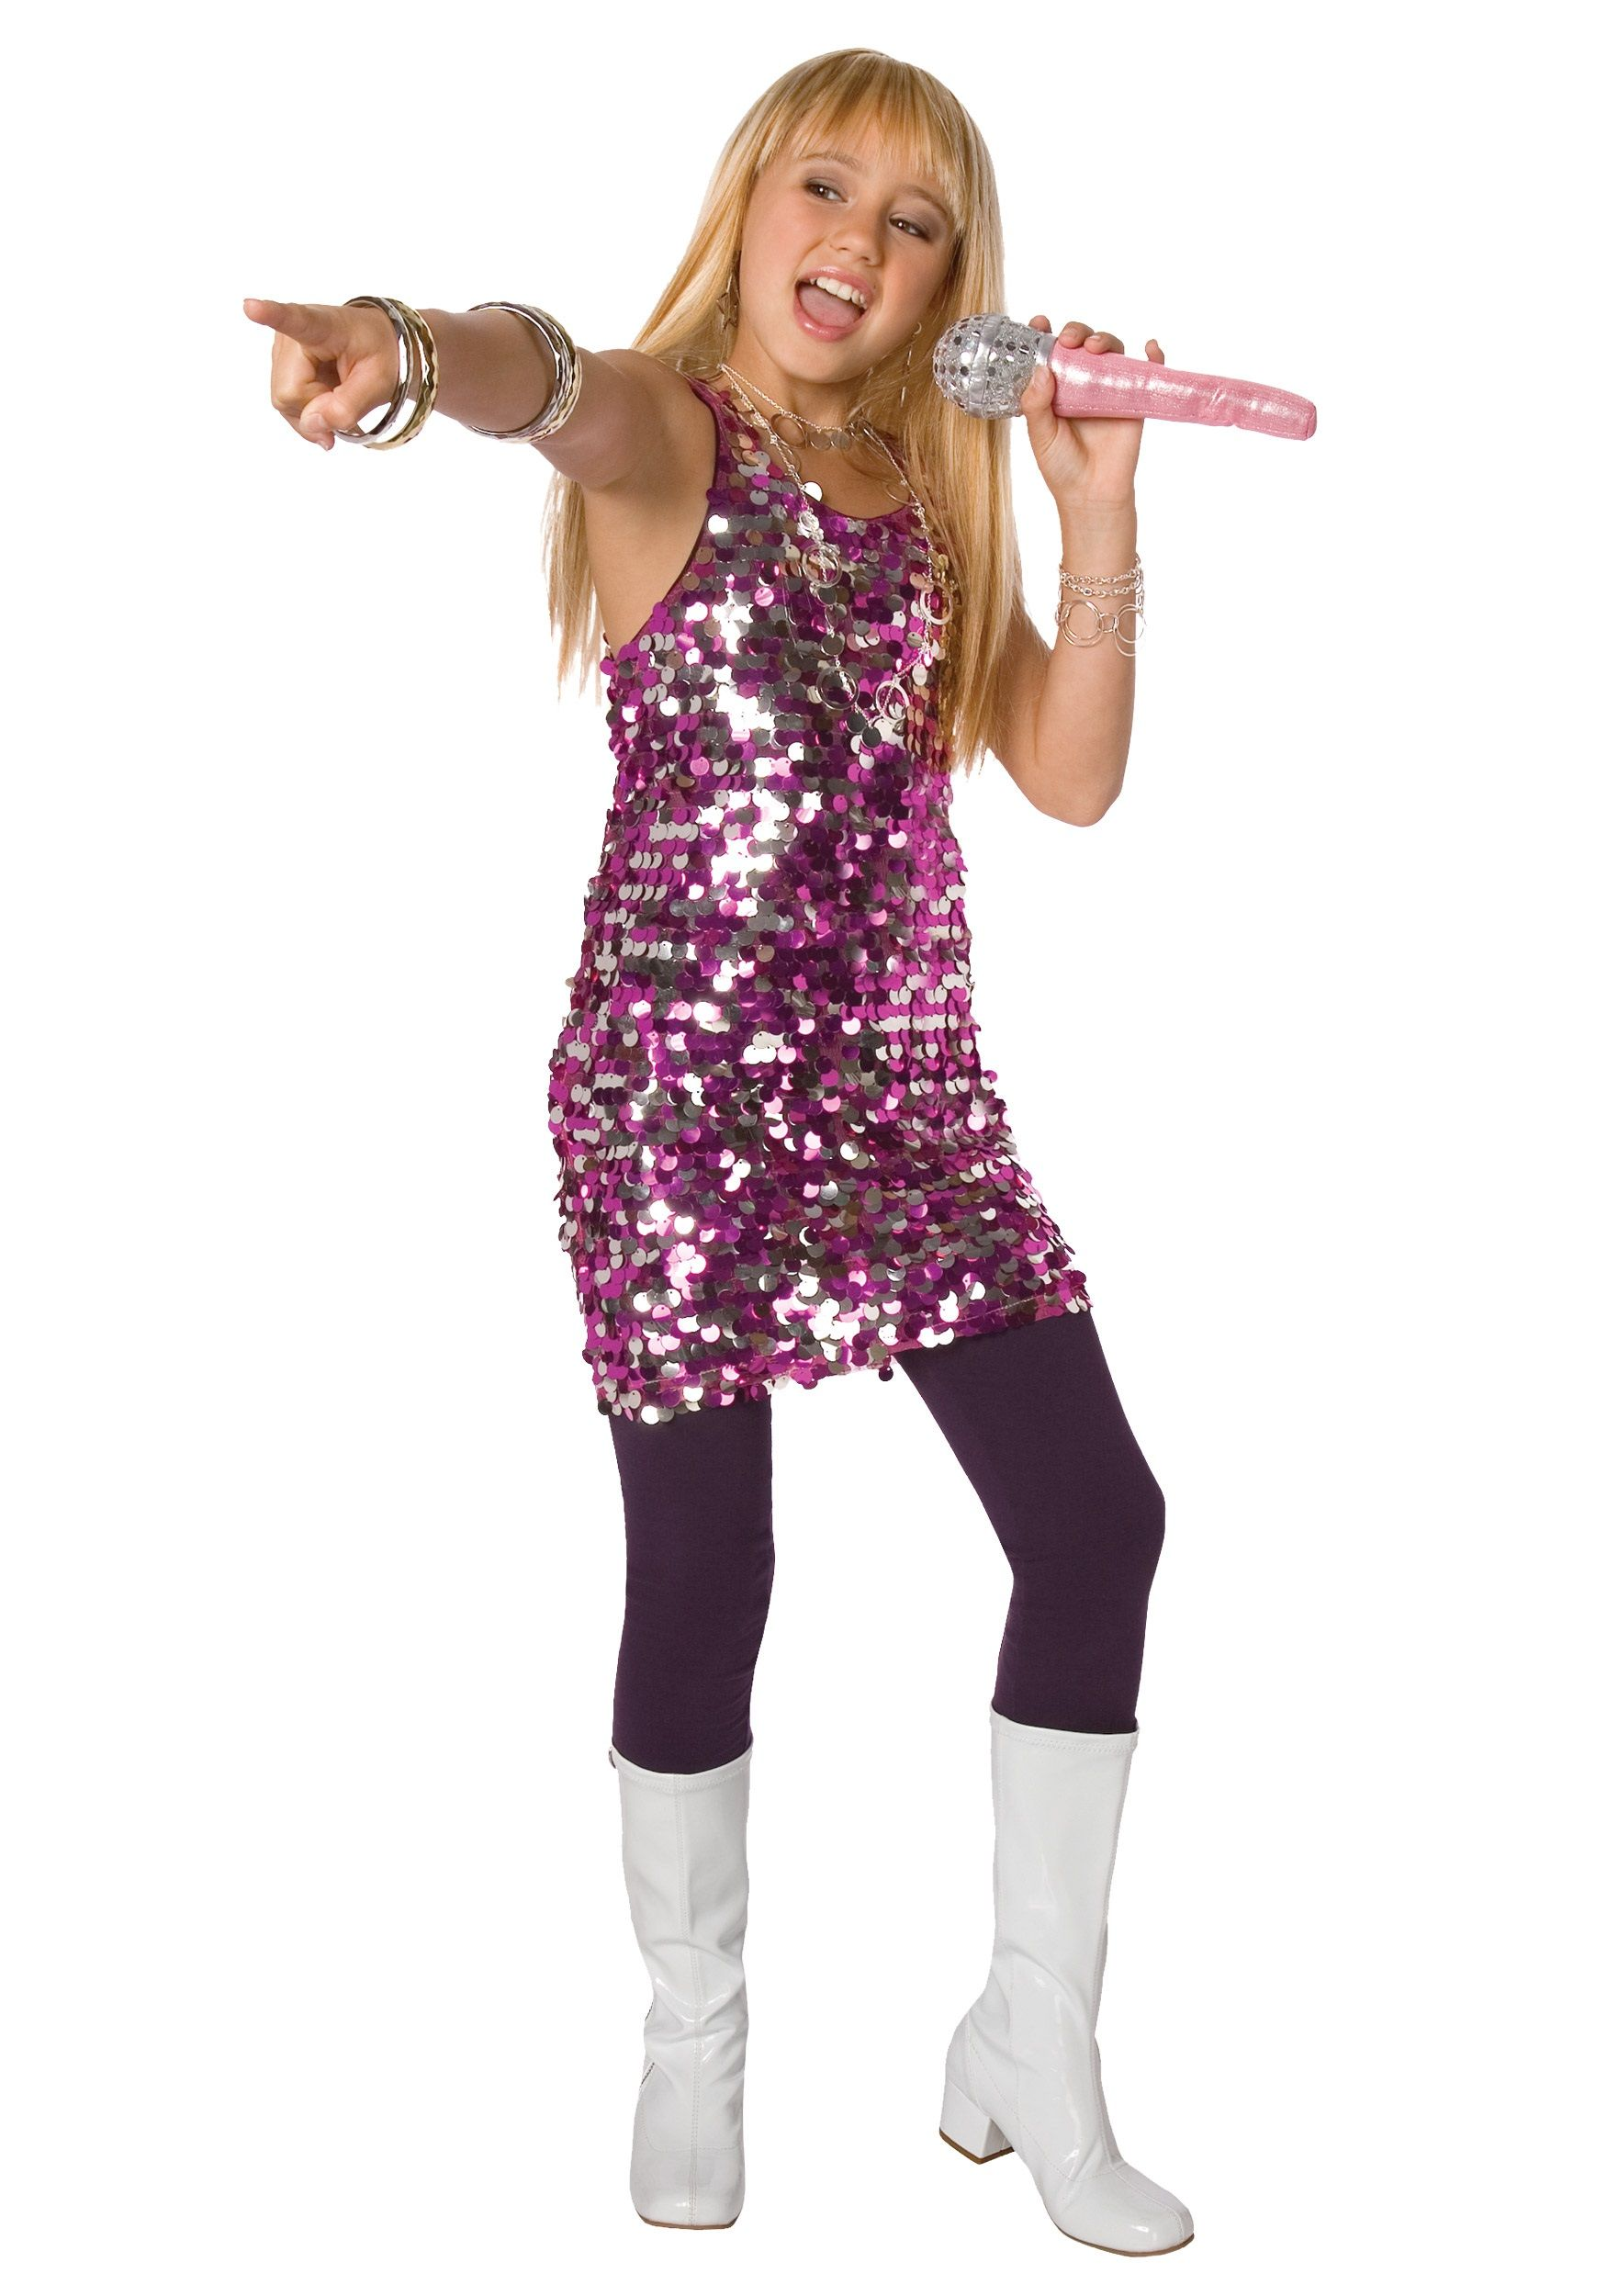 7c1ce612 Girls Sequin Diva Dress Costume   costume dress in 2019   Halloween ...